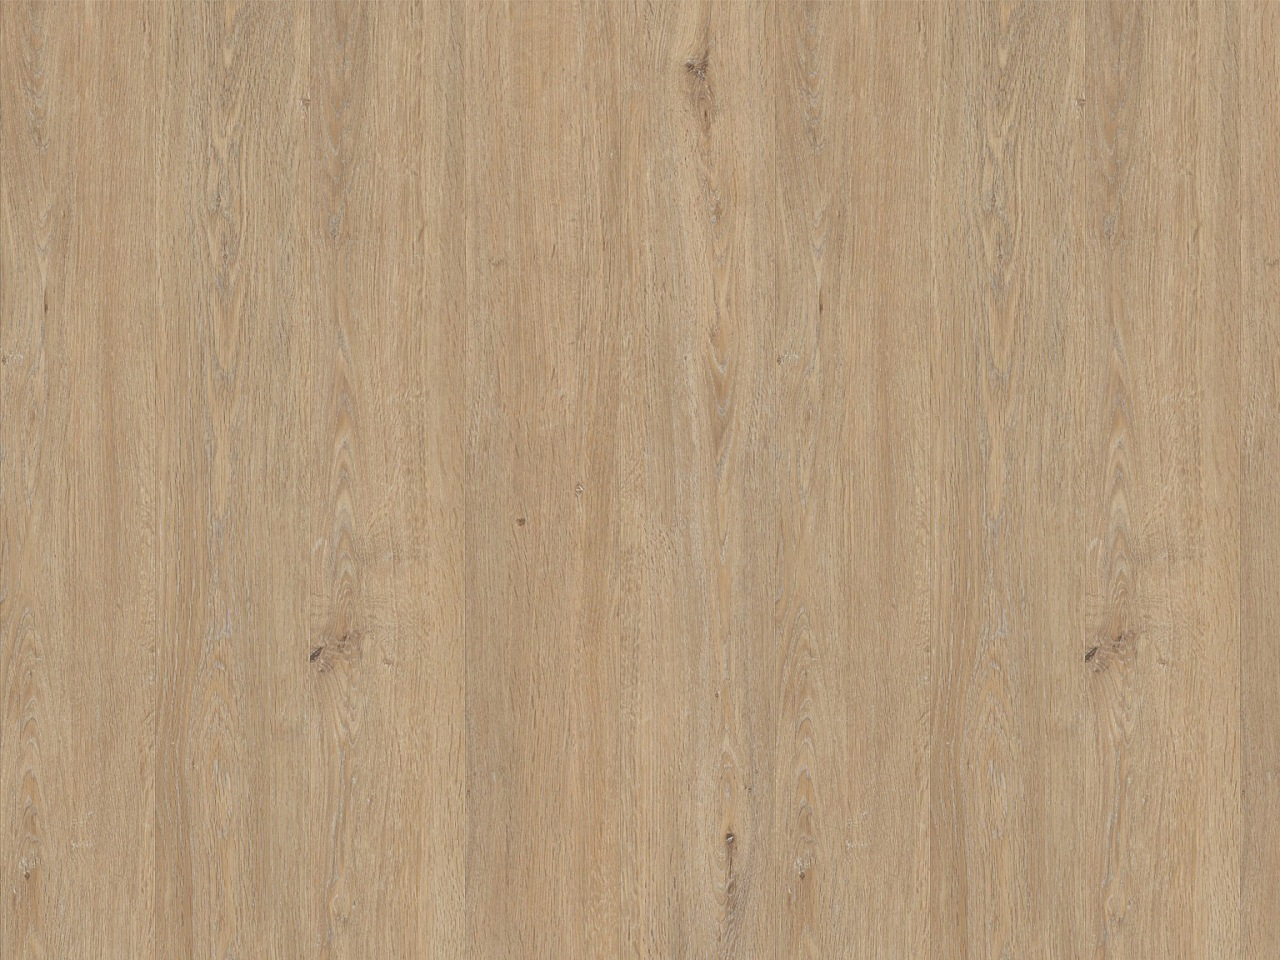 Designbelag Adamo wood – Eiche Brügge, 344003